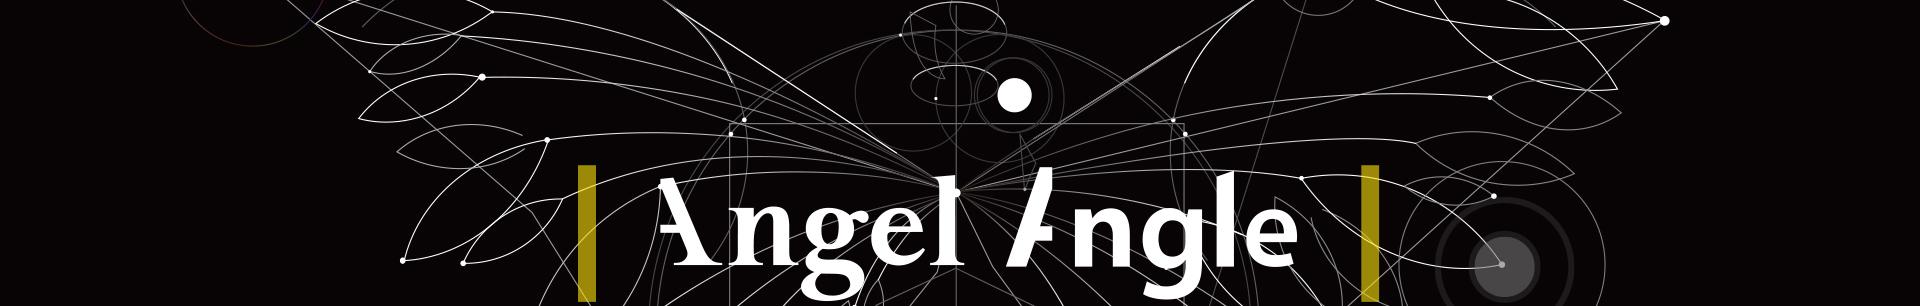 AngelAngle banner